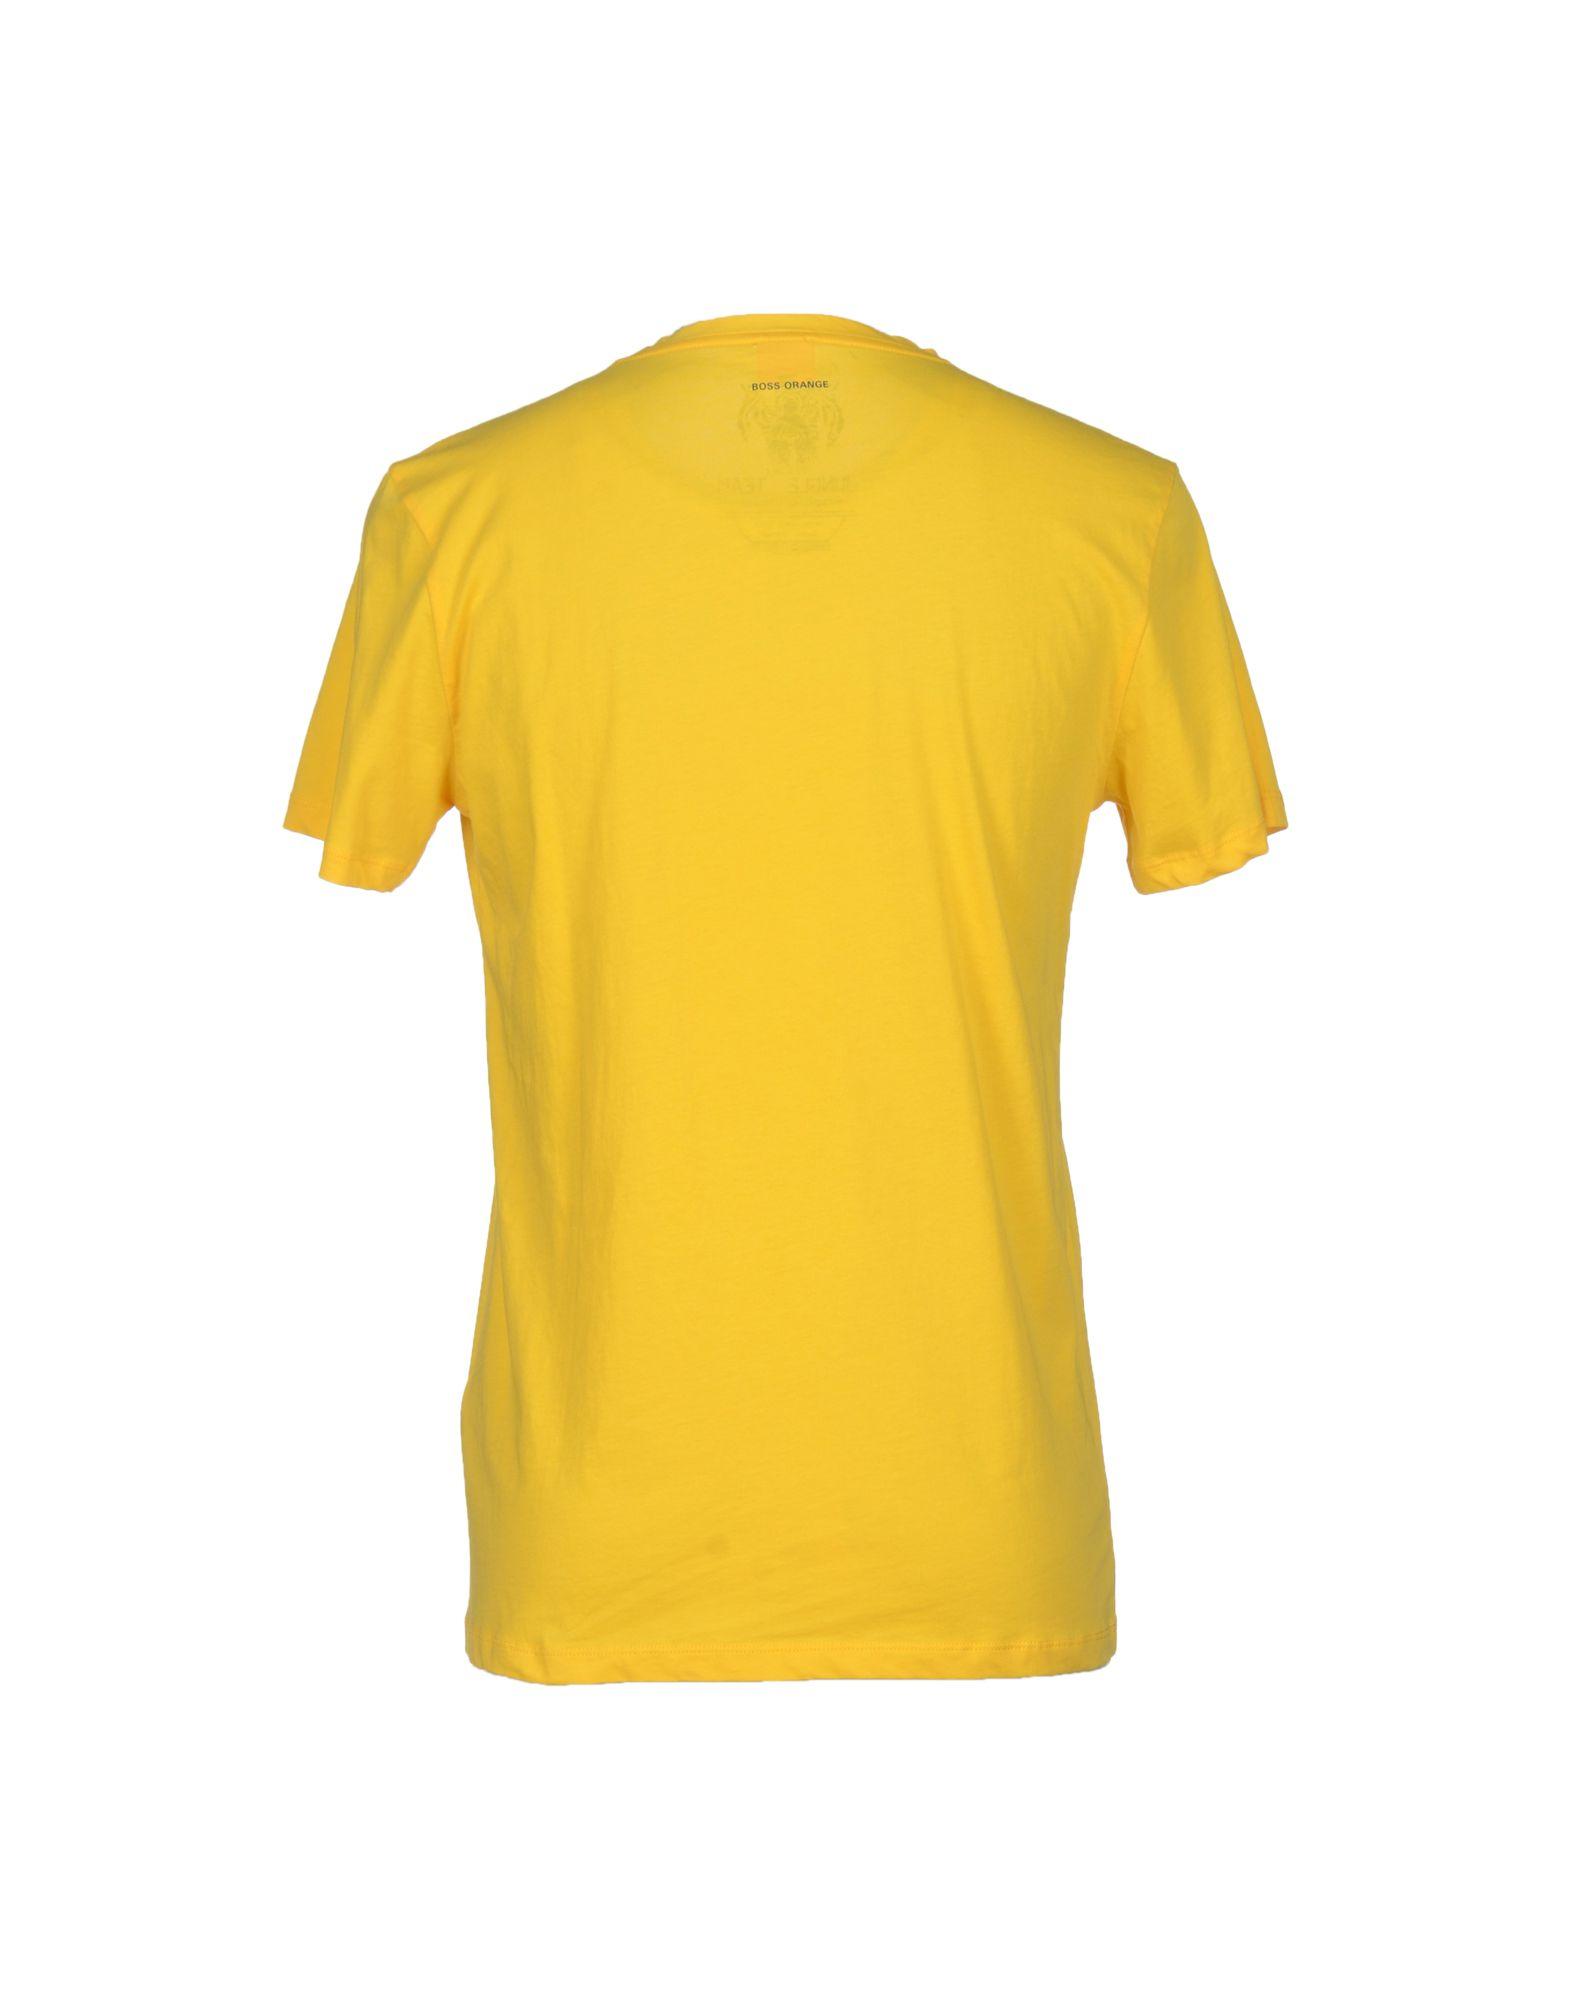 lyst boss orange t shirt in yellow for men. Black Bedroom Furniture Sets. Home Design Ideas